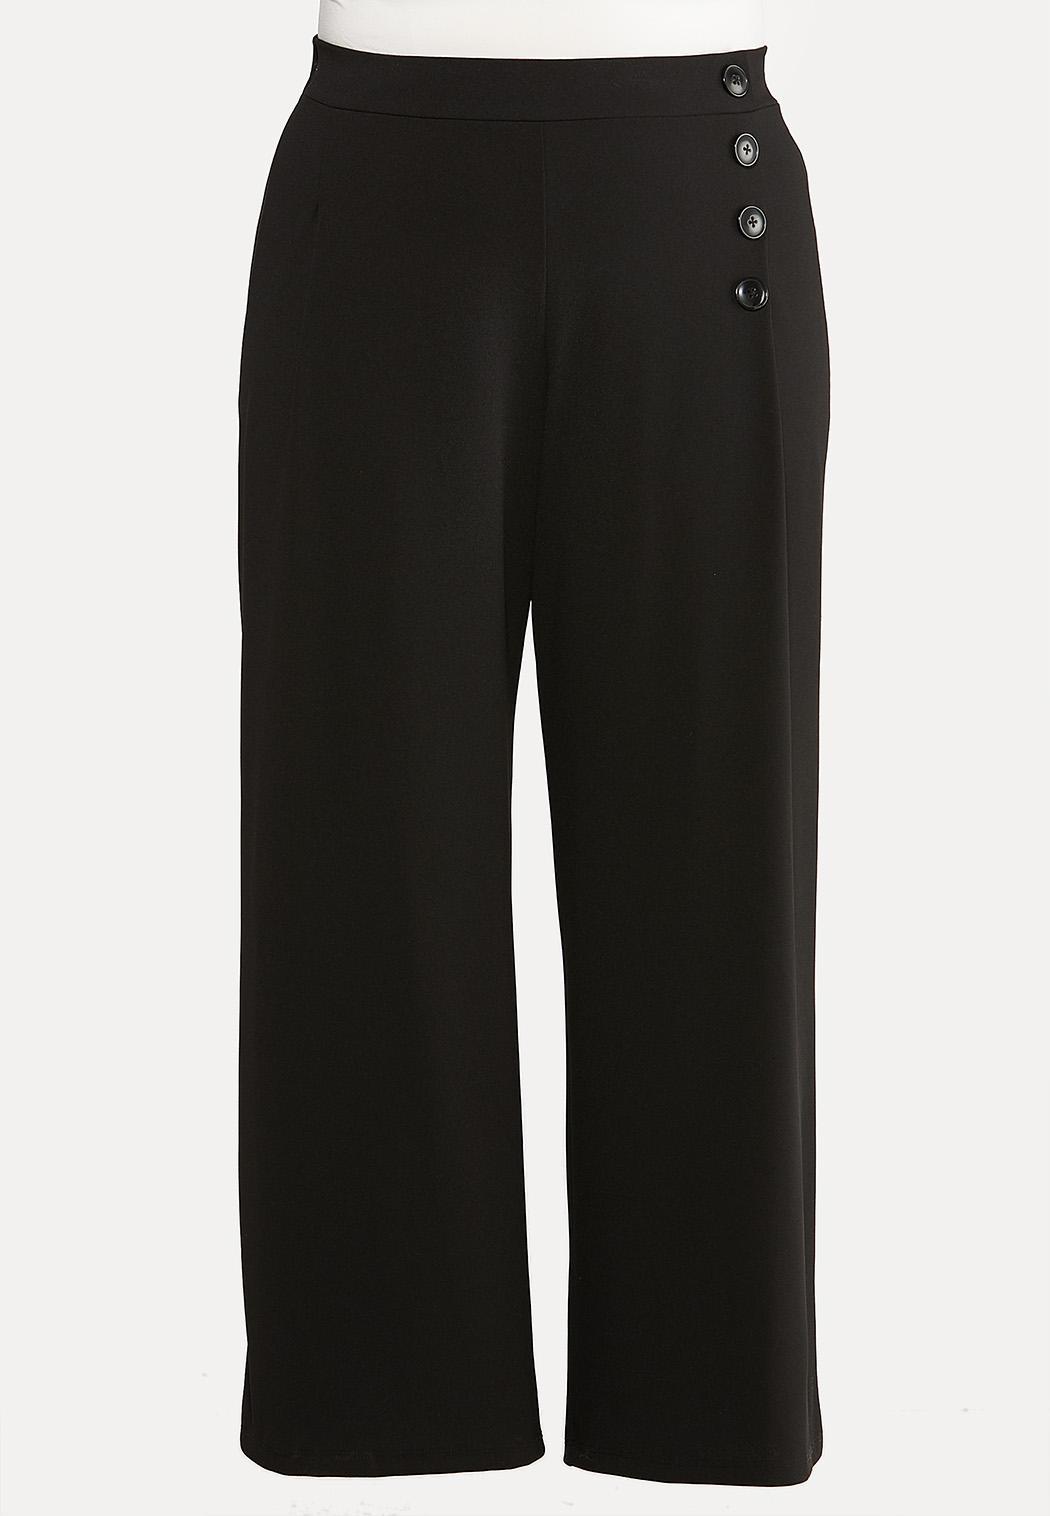 Plus Size Wide Leg Button Pants Wide Leg Cato Fashions